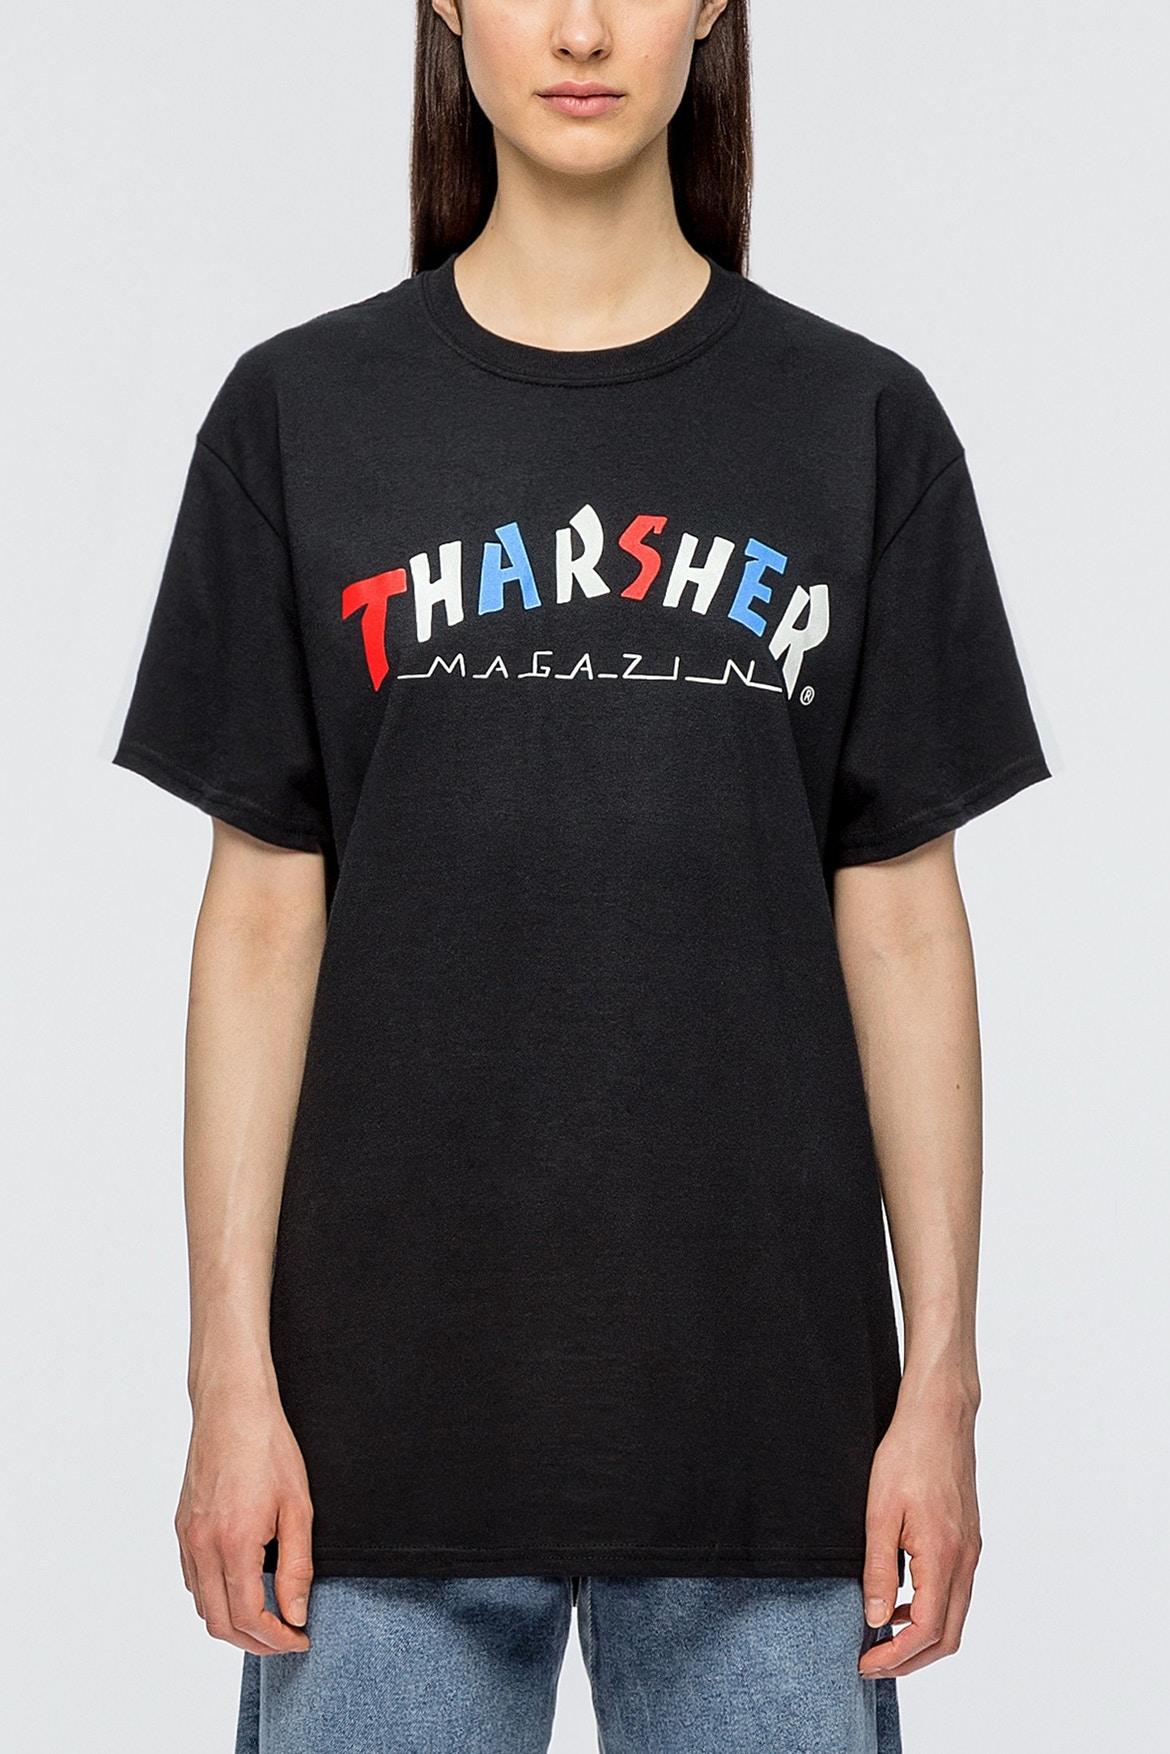 thrasher roses hoodie shirt